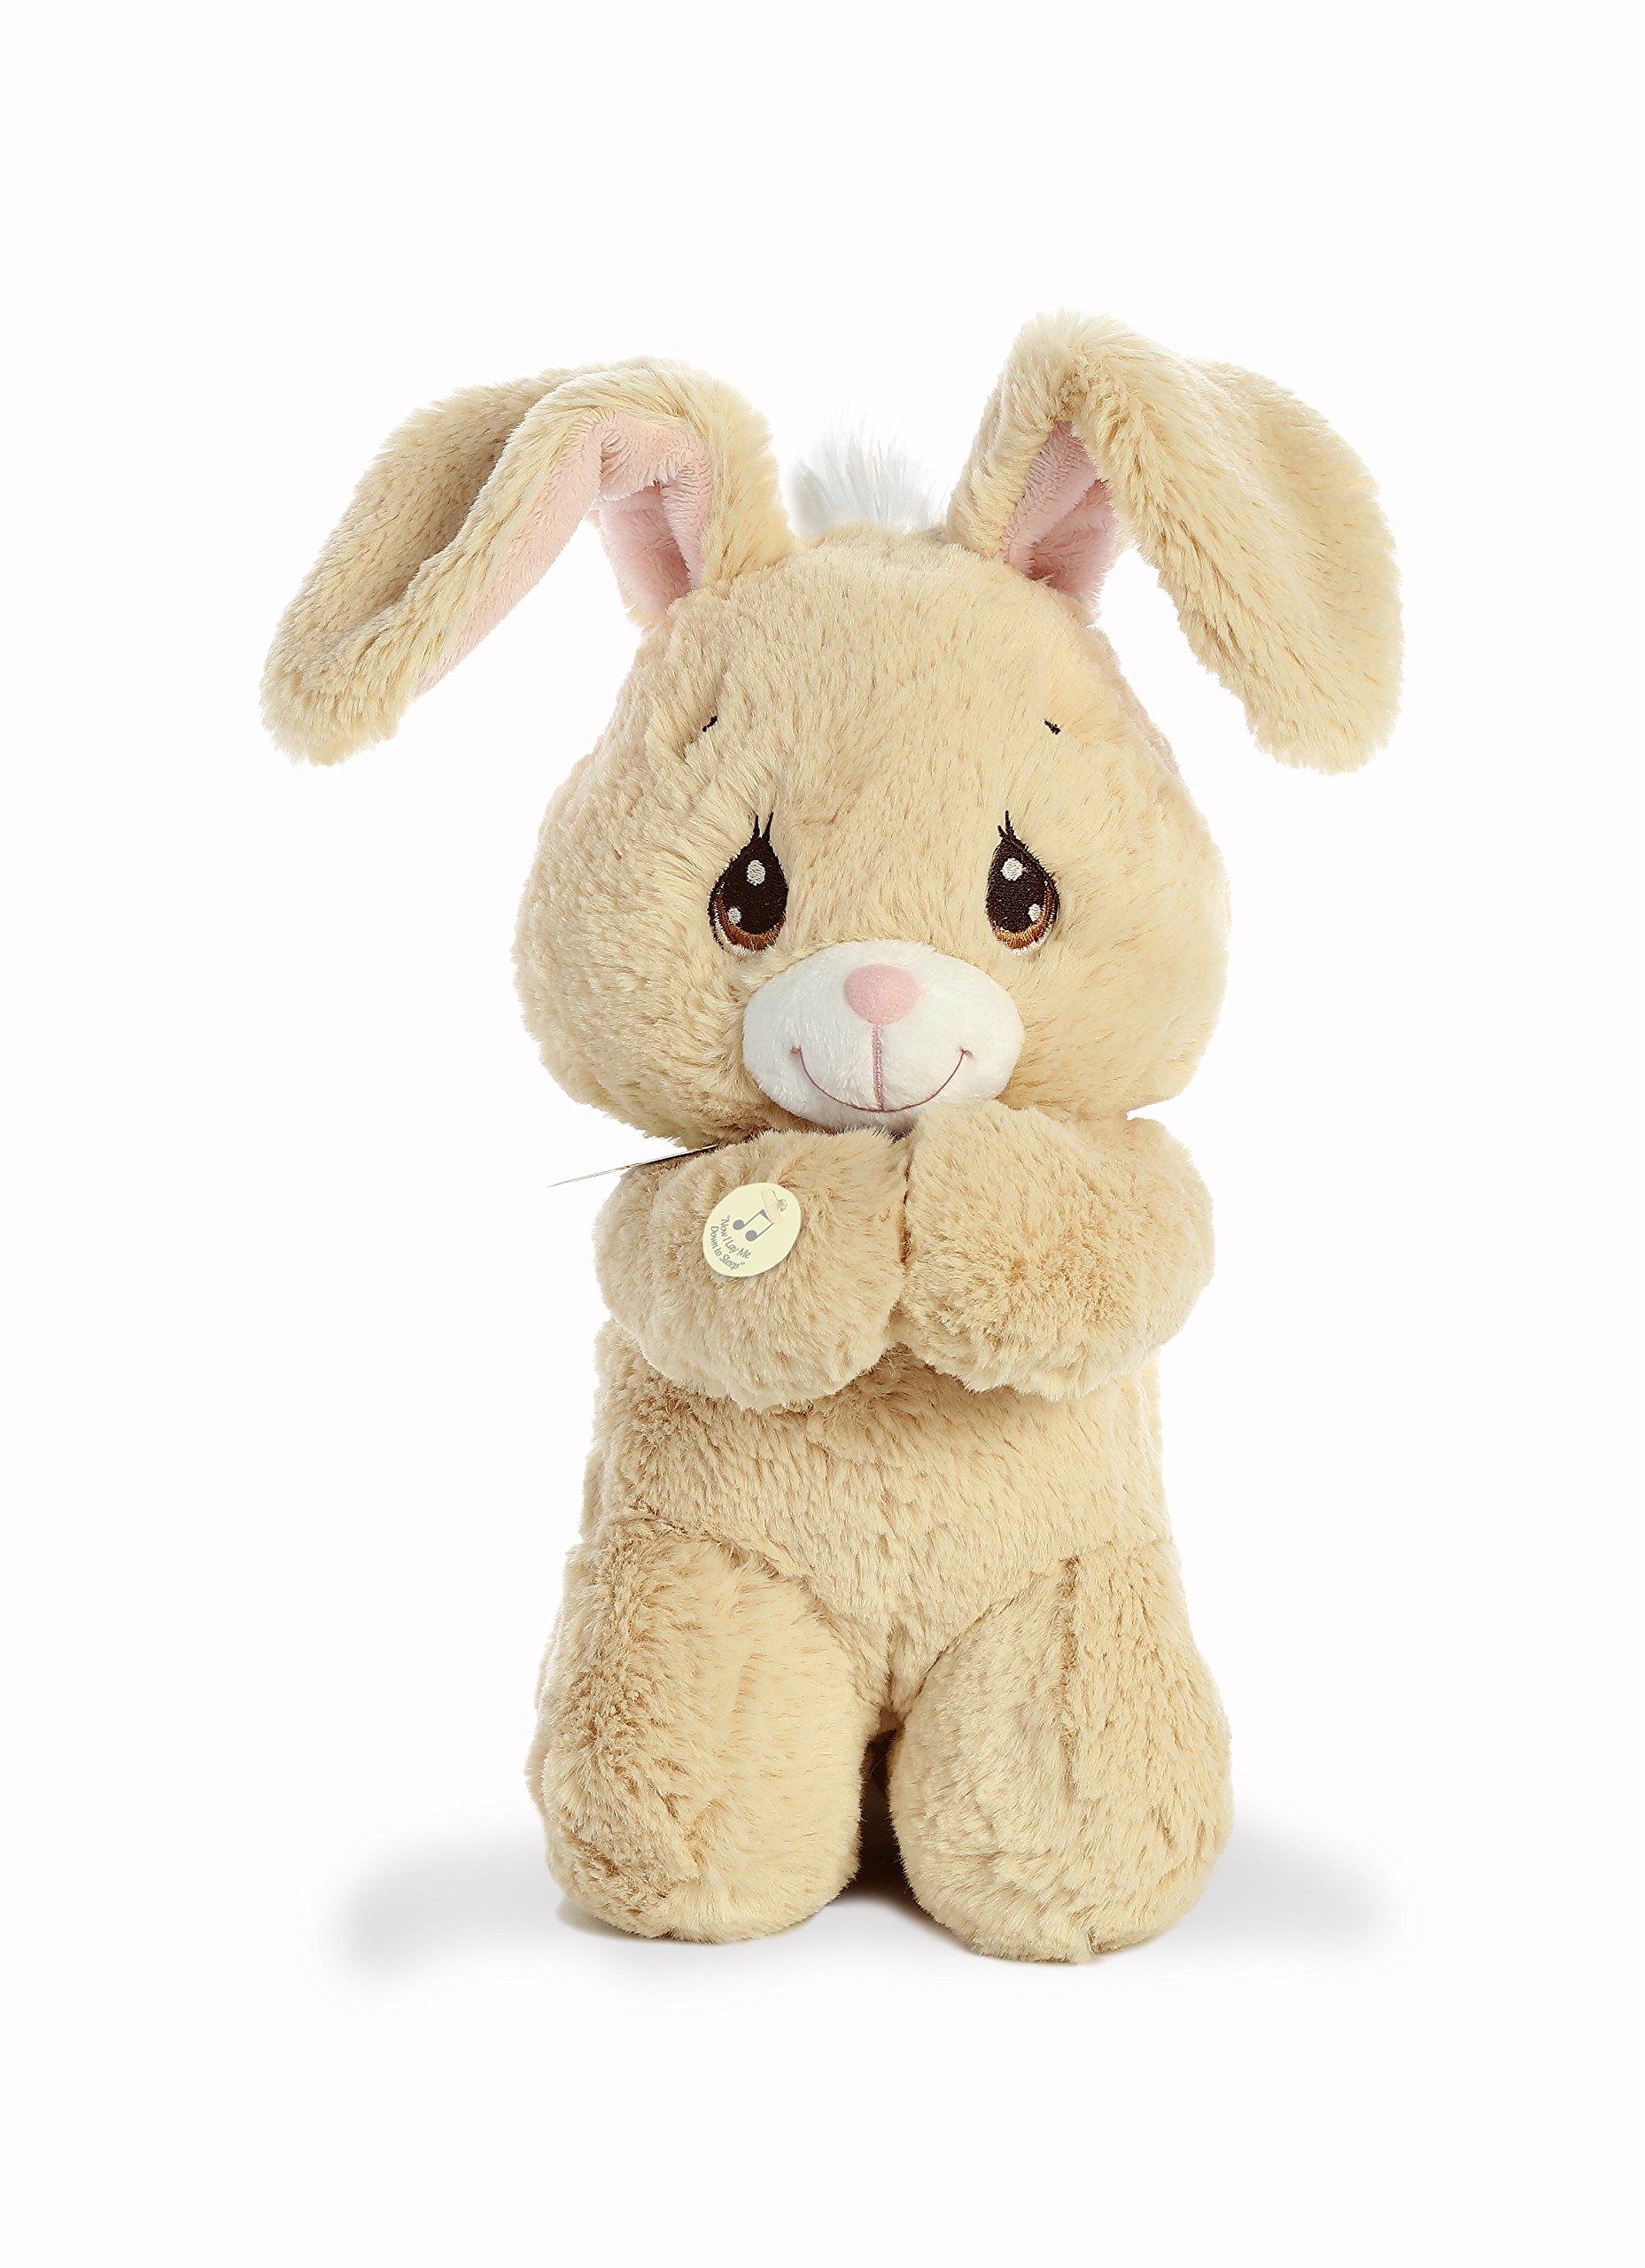 "Aurora World Precious Moments Musical Plush Toy Animal, Floppy Prayer Bunny, 10"""